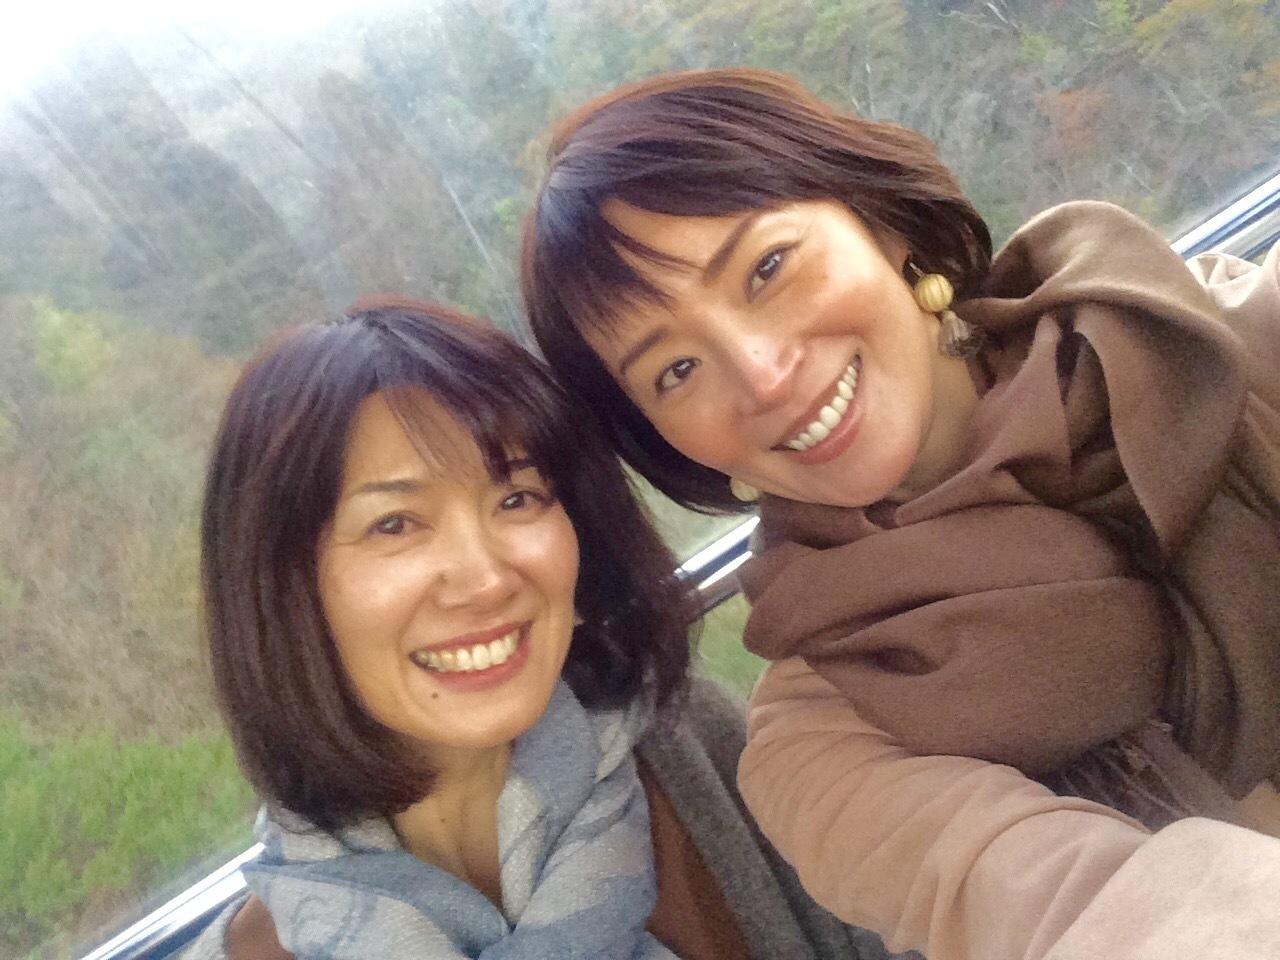 ASTALIFT with Marisol & eclat「大人女子の美容遠足」_1_2-3